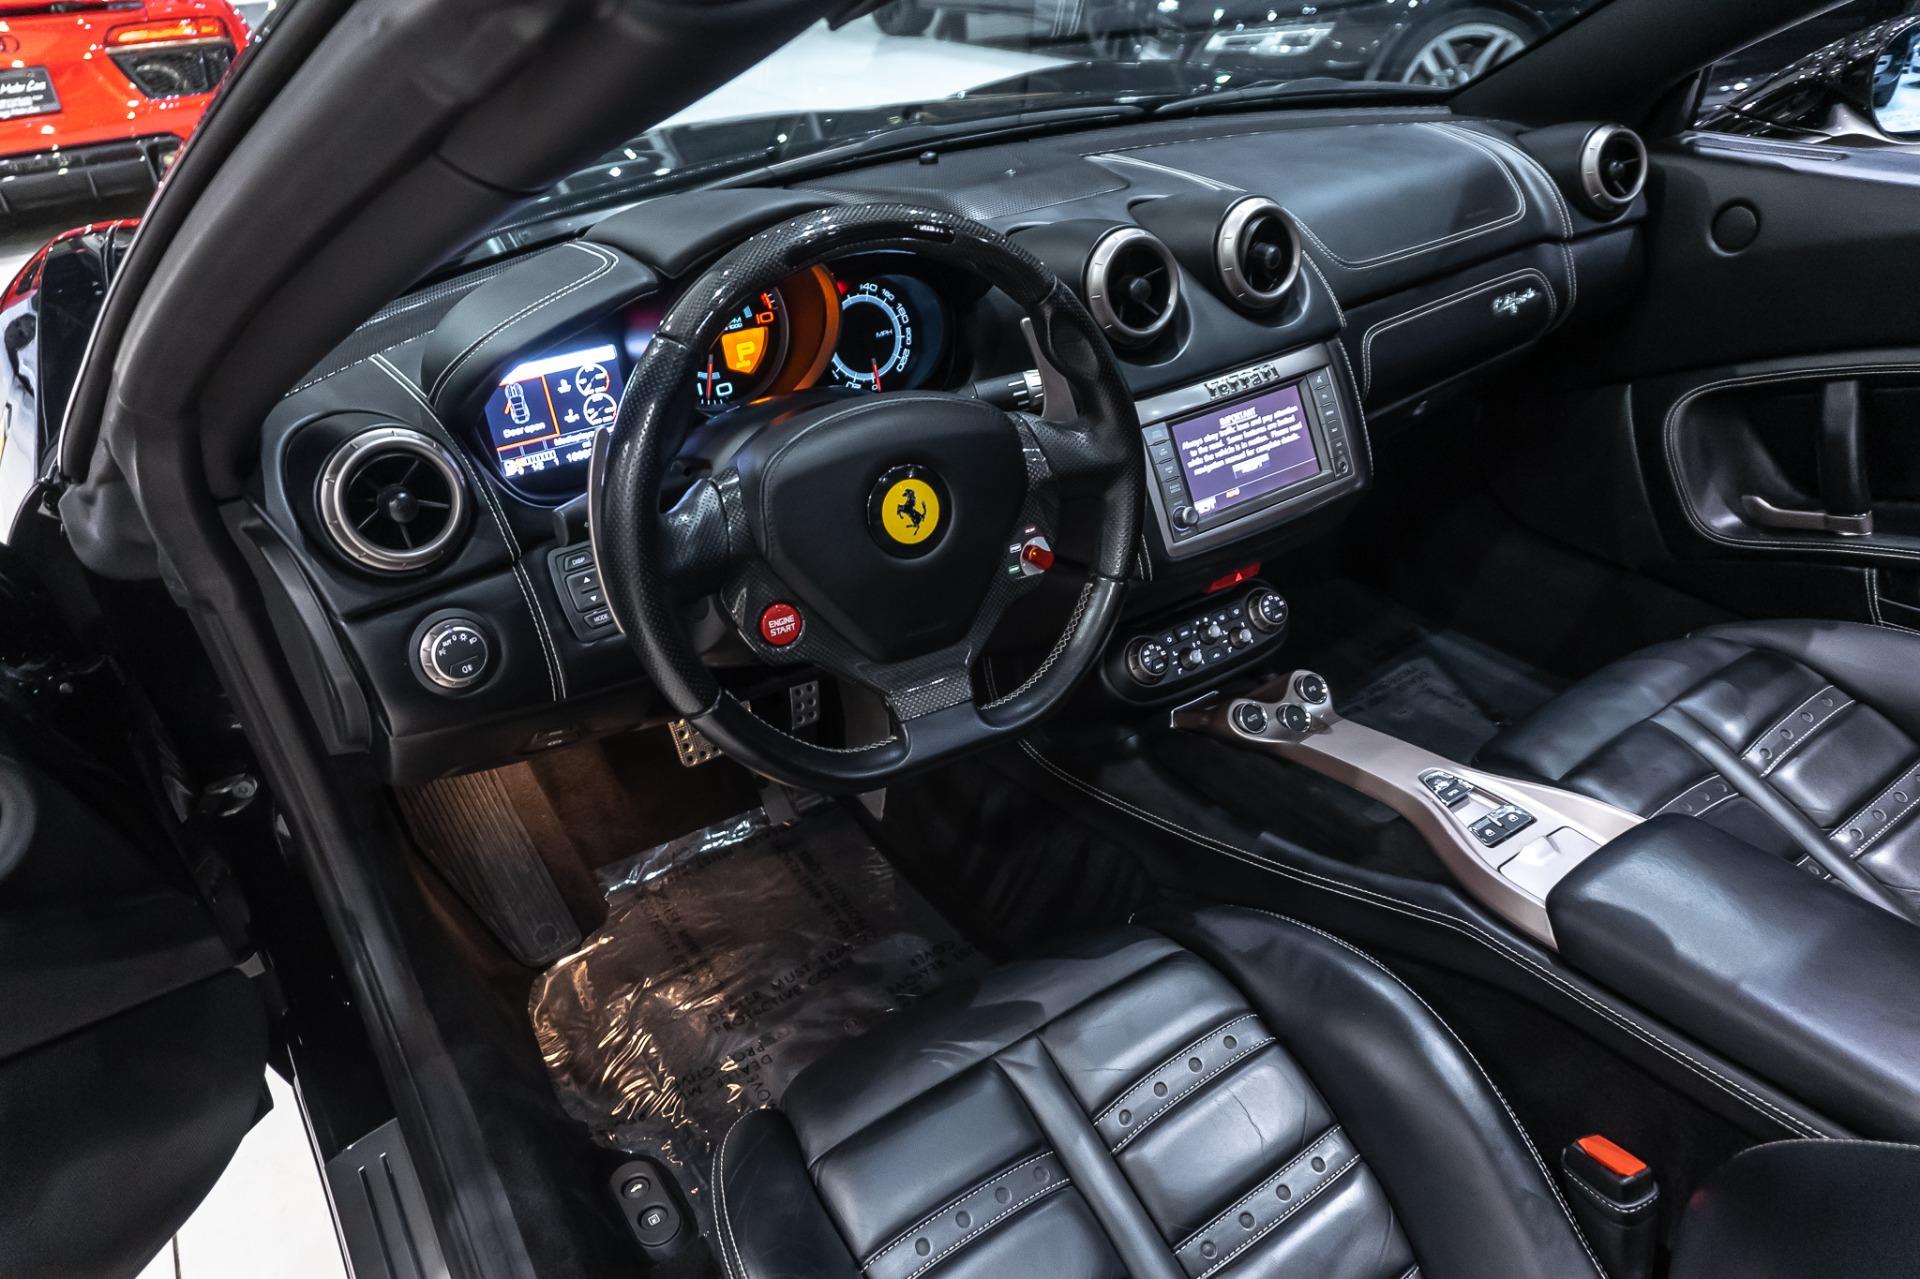 Used-2013-Ferrari-California-CONVERTIBLE-FABSPEED-EXHAUST-CERAMIC-COATED-SERVICED